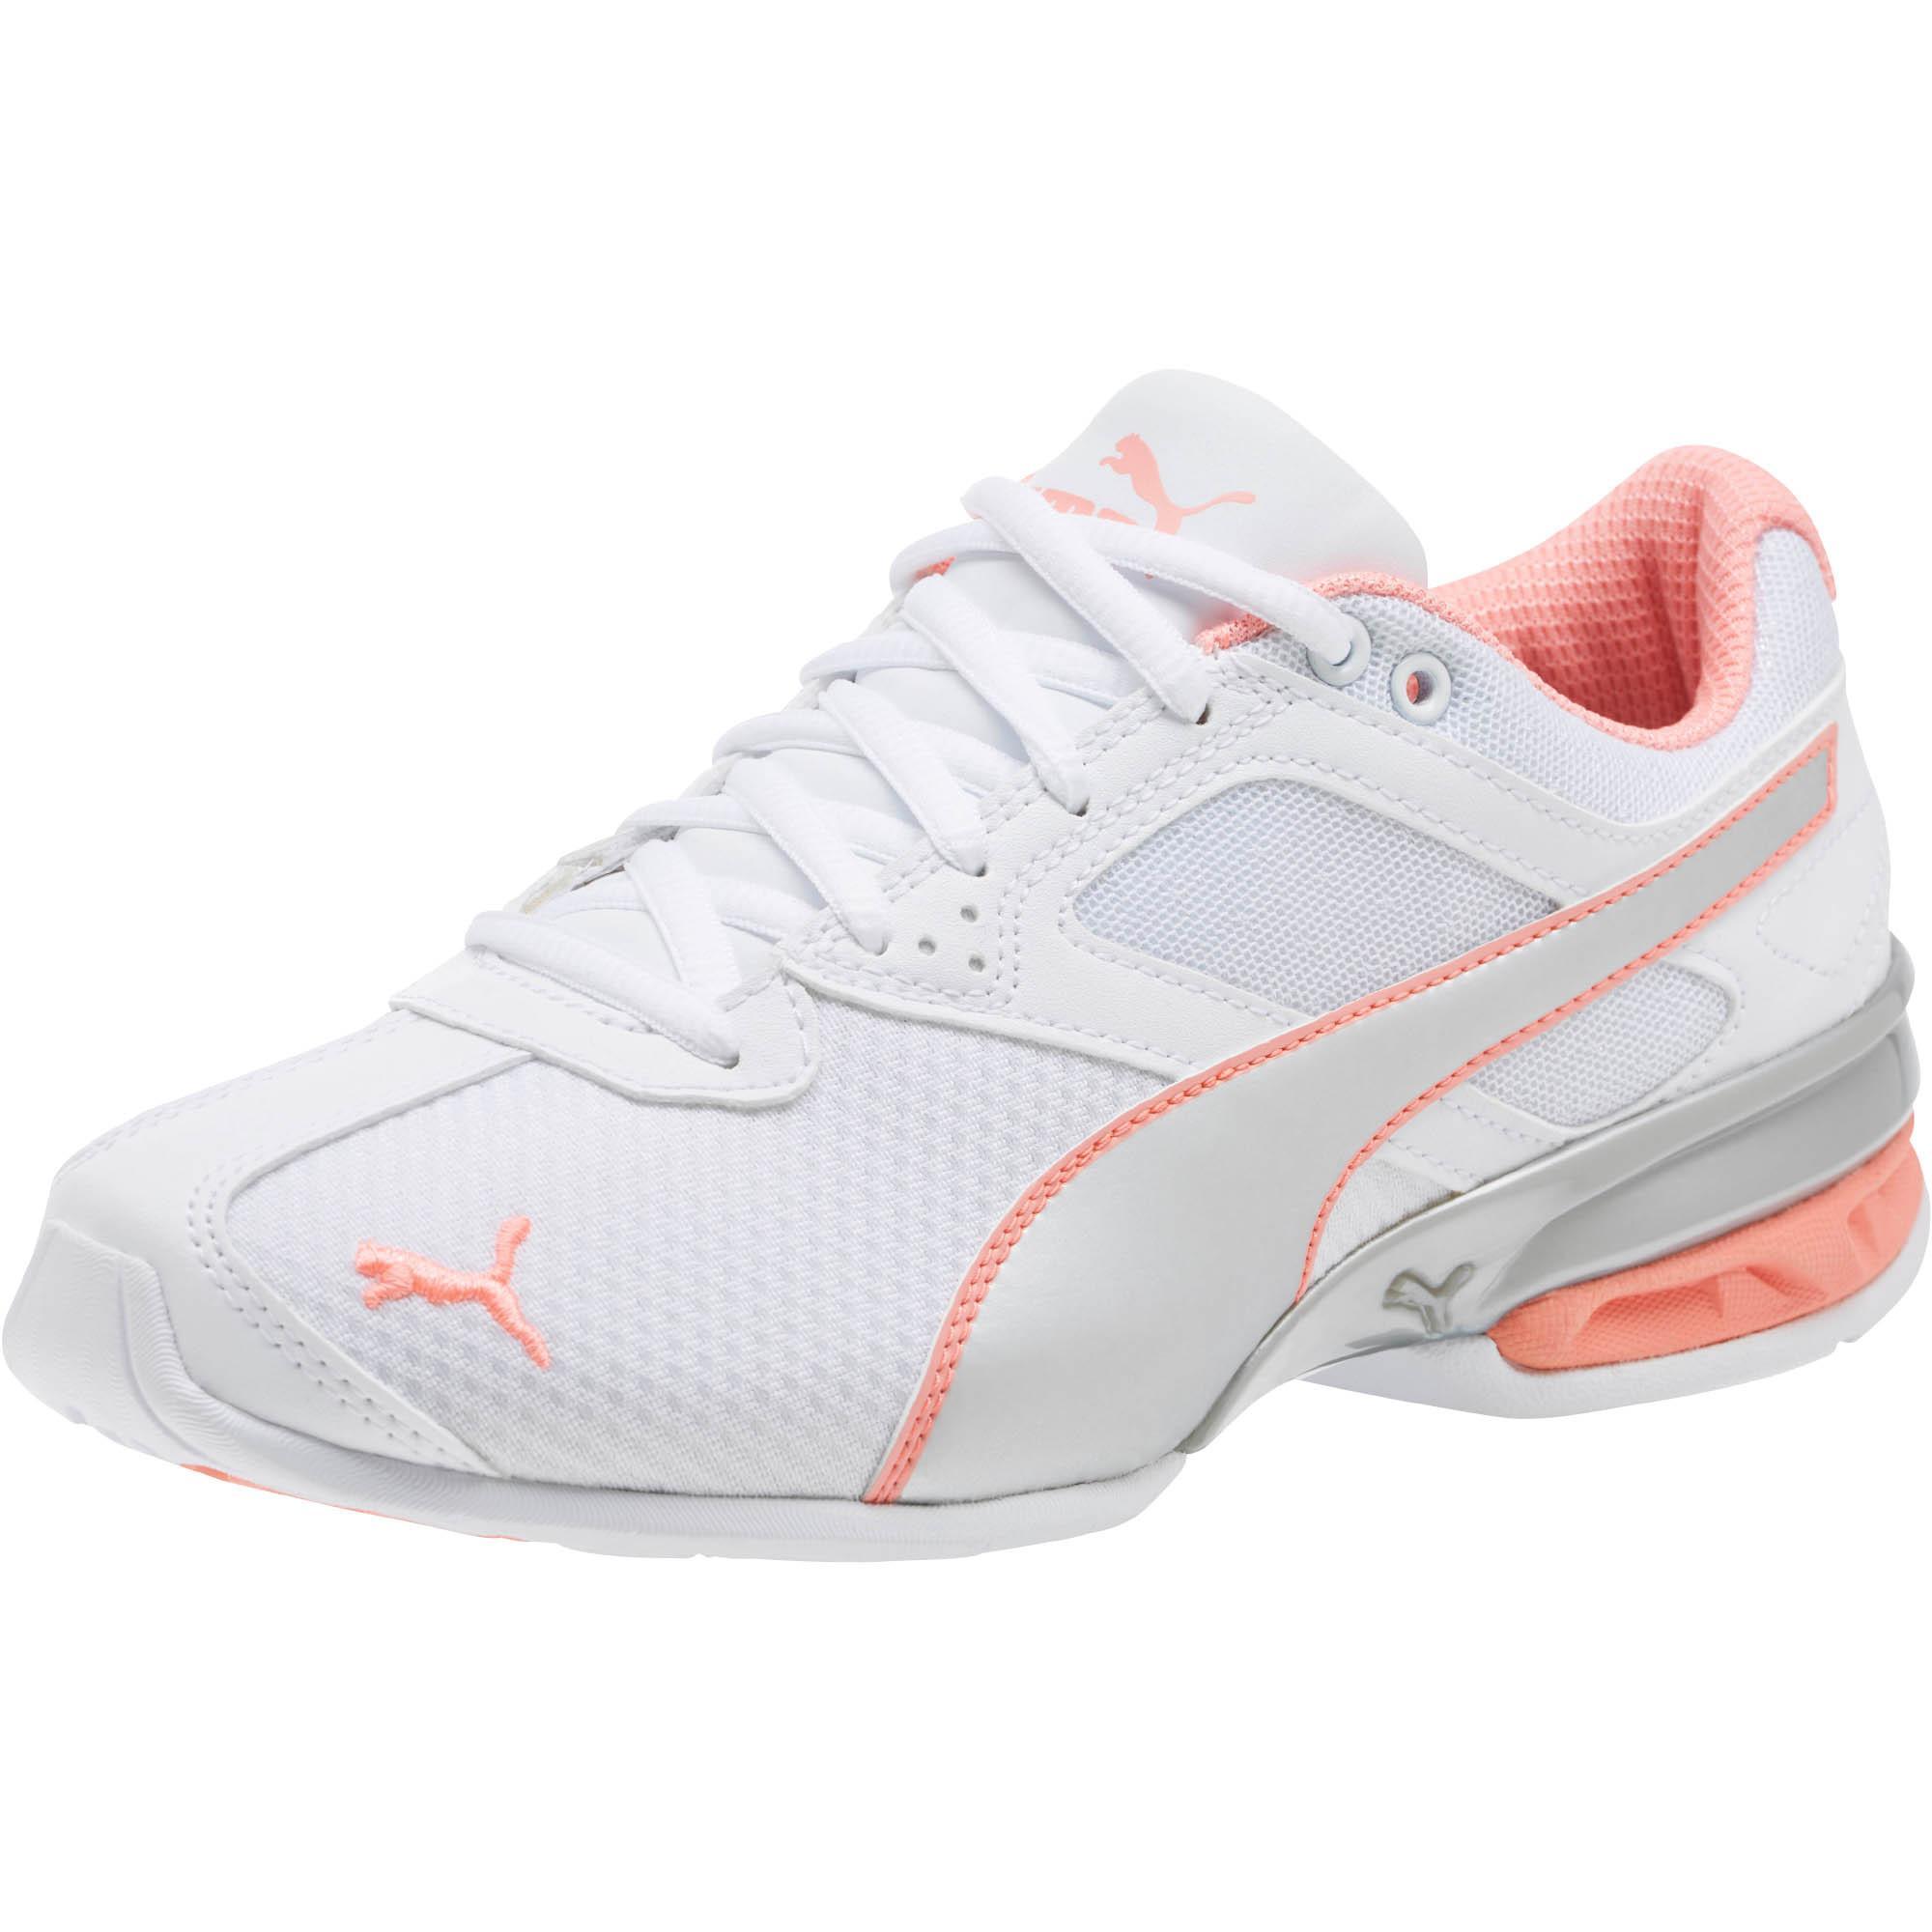 16f7b0ceb4c Lyst - PUMA Tazon 6 Metallic Women s Sneakers - Save 23%